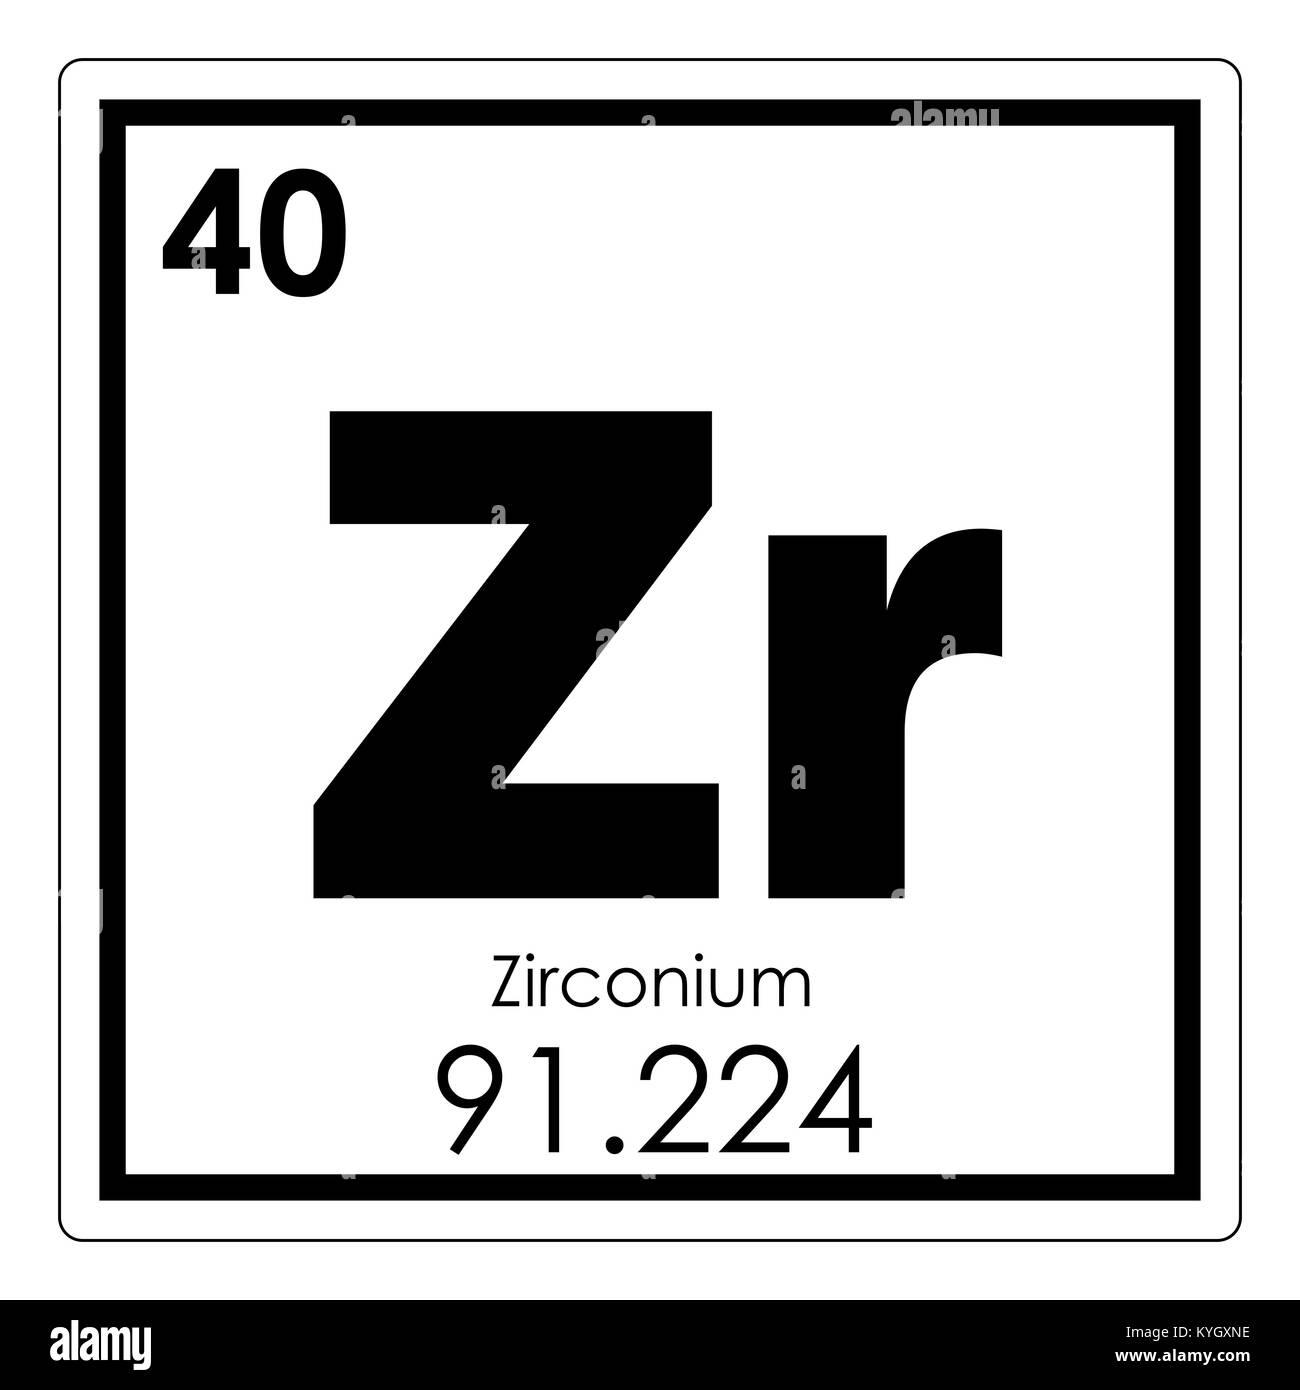 Zirconium chemical element periodic table science symbol stock photo zirconium chemical element periodic table science symbol urtaz Image collections